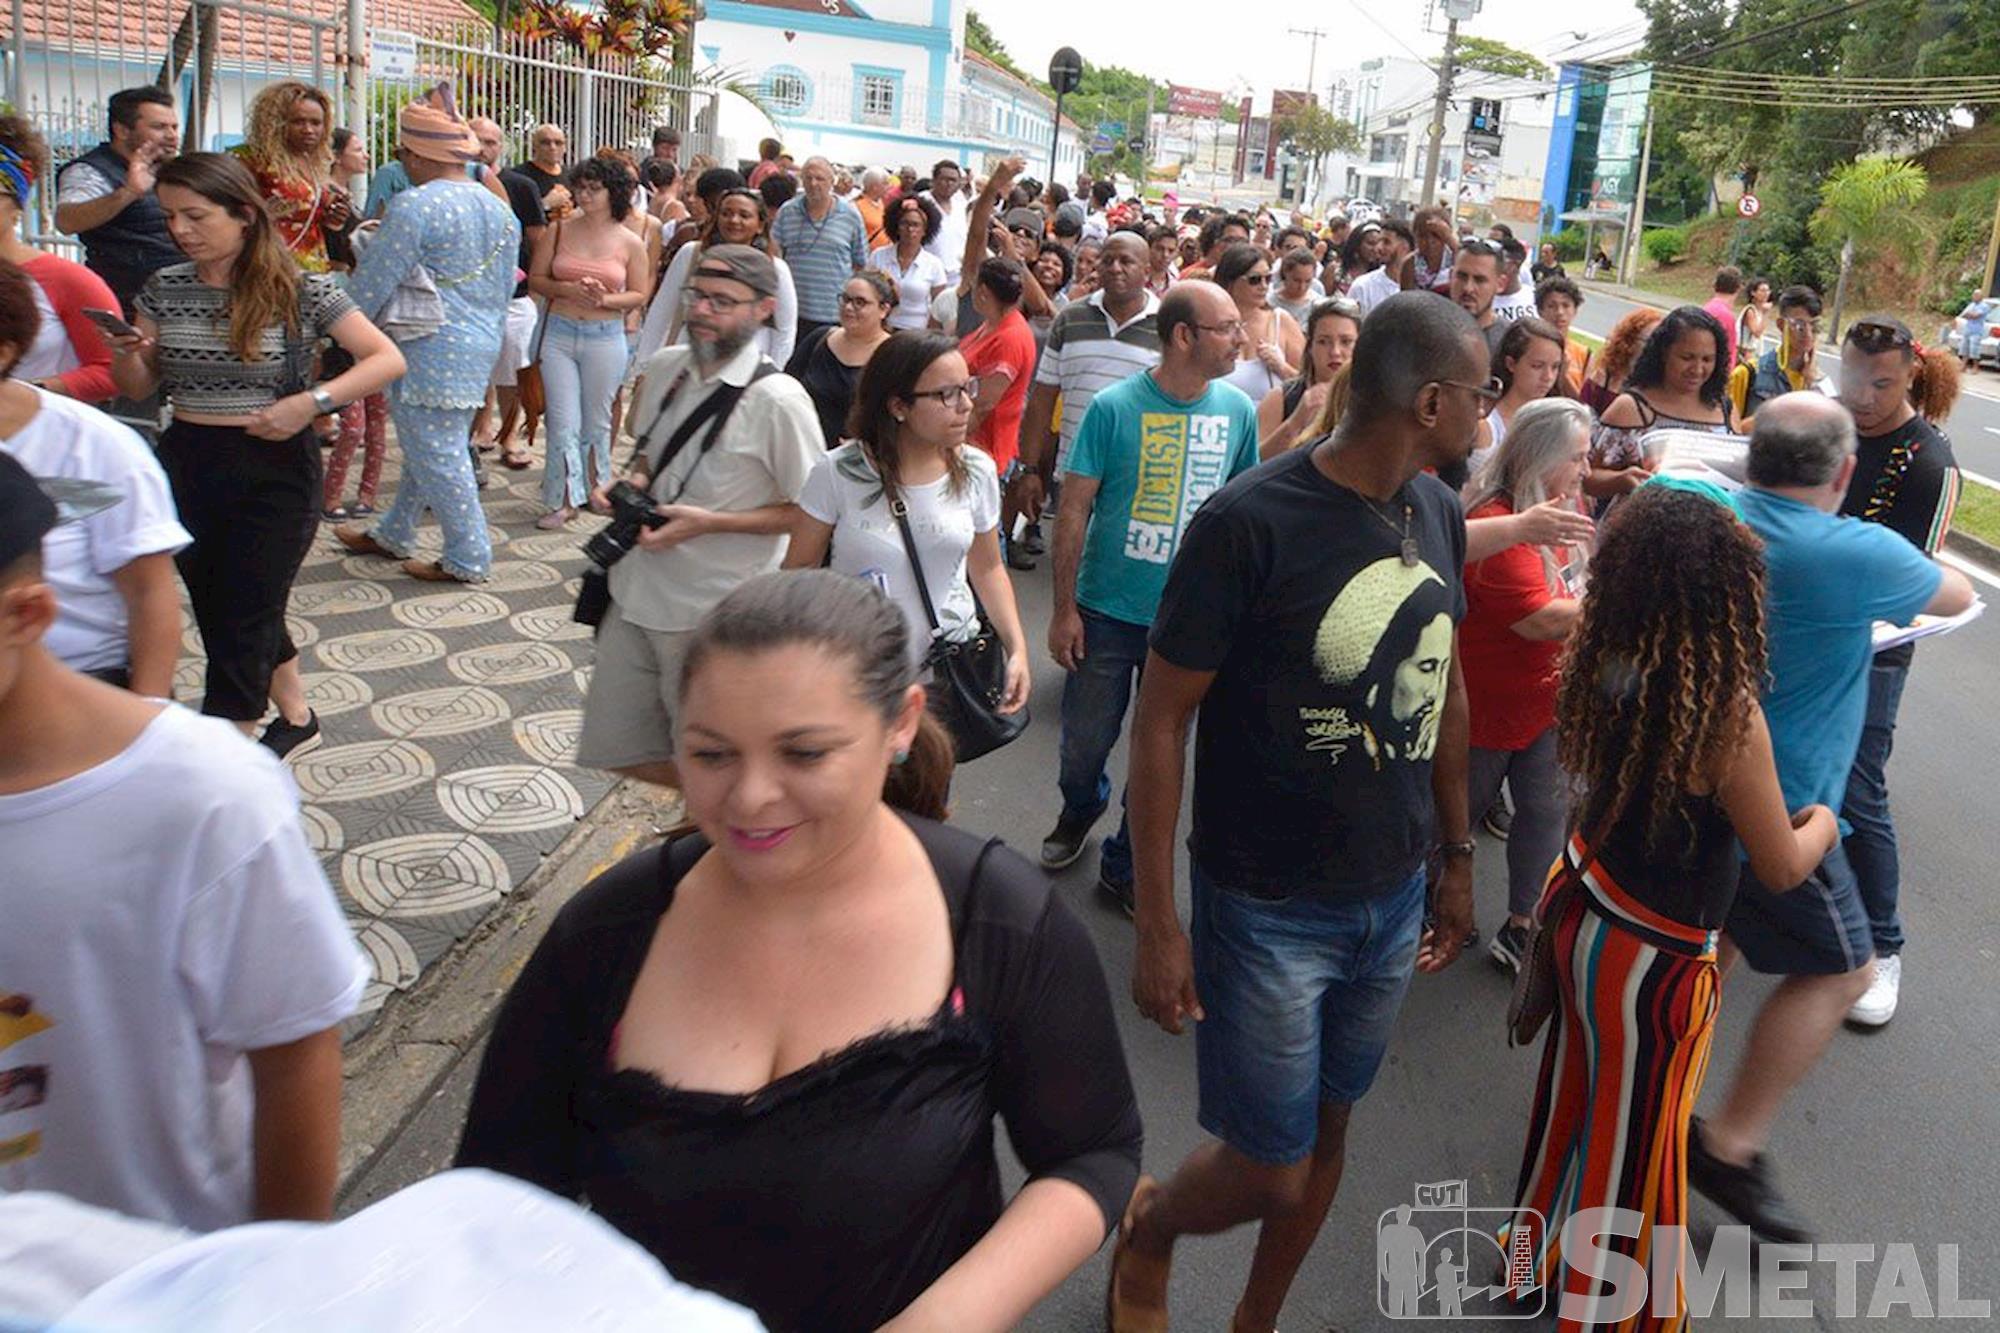 1ª Marcha Zumbi & Dandara em Sorocaba, marcha, negro, zumbi, dandara, Foguinho/Imprensa SMetal